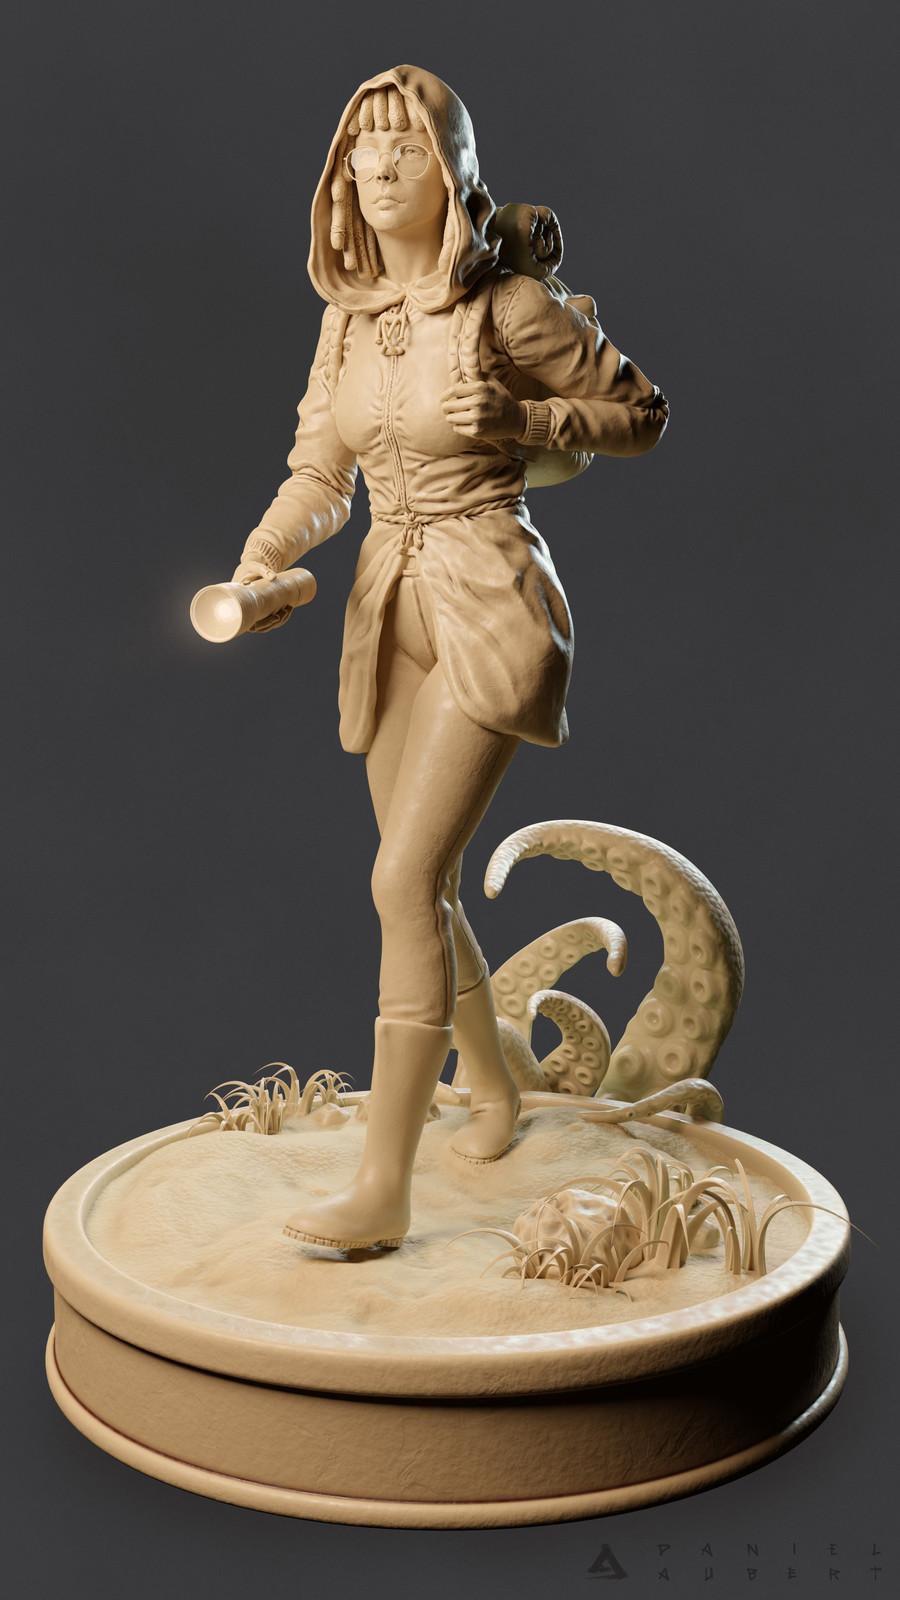 Lost - Blender sculpt